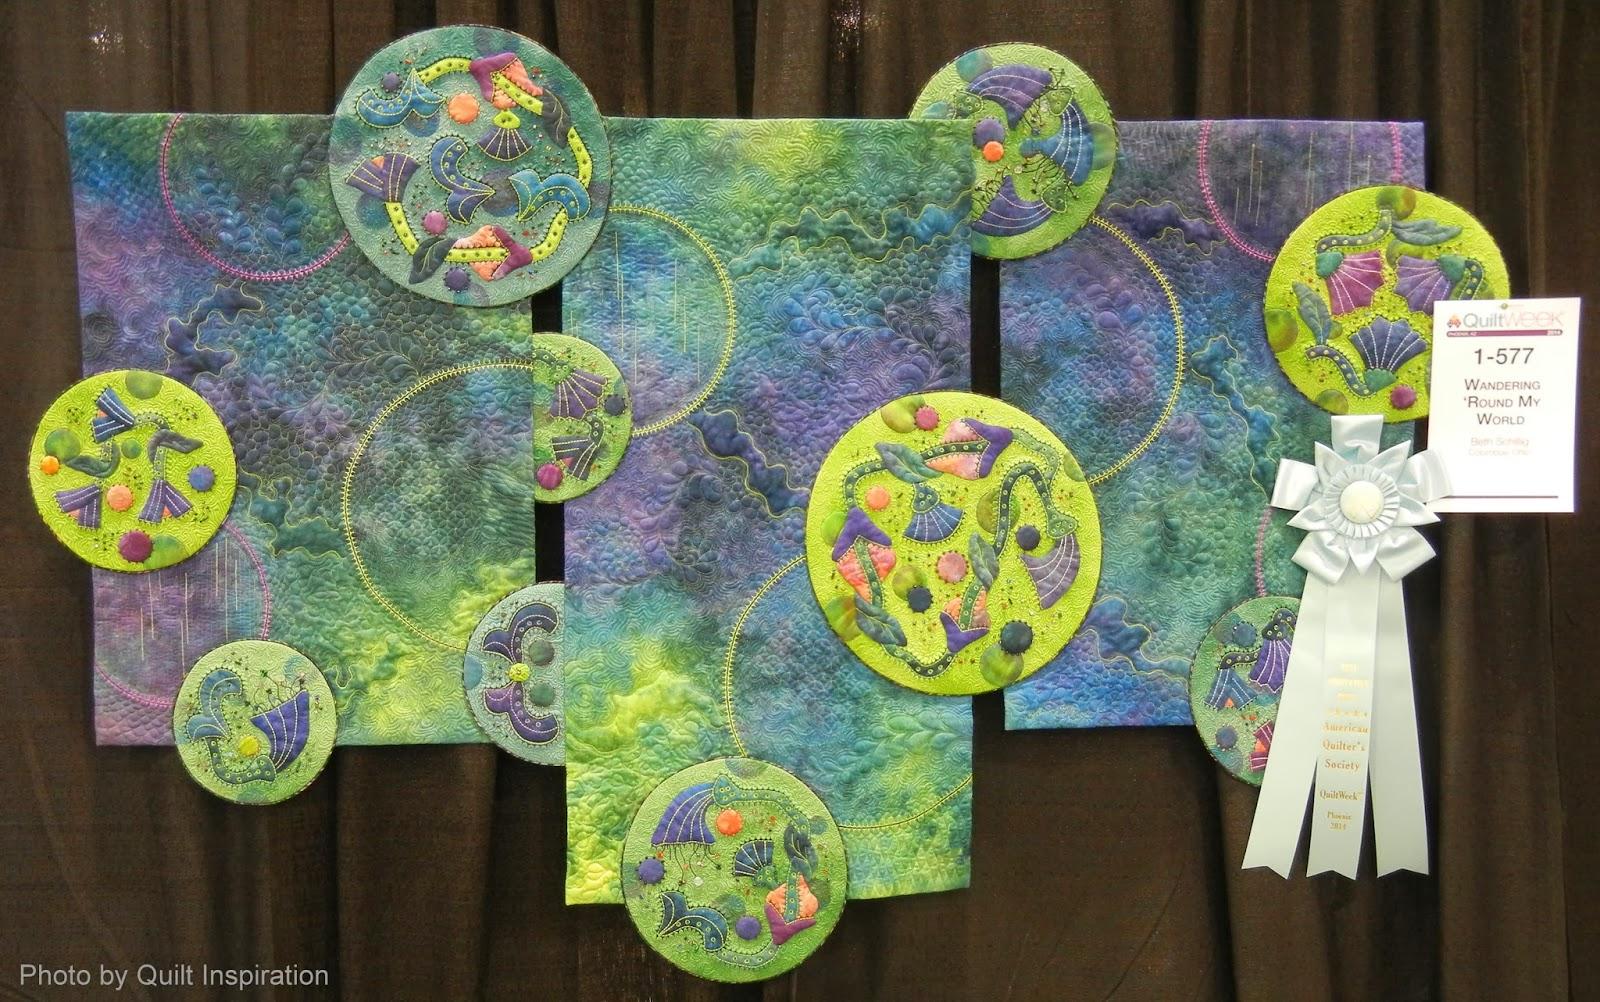 quilt inspiration best of aqs quilt week 2014 phoenix arizona rh quiltinspiration blogspot com